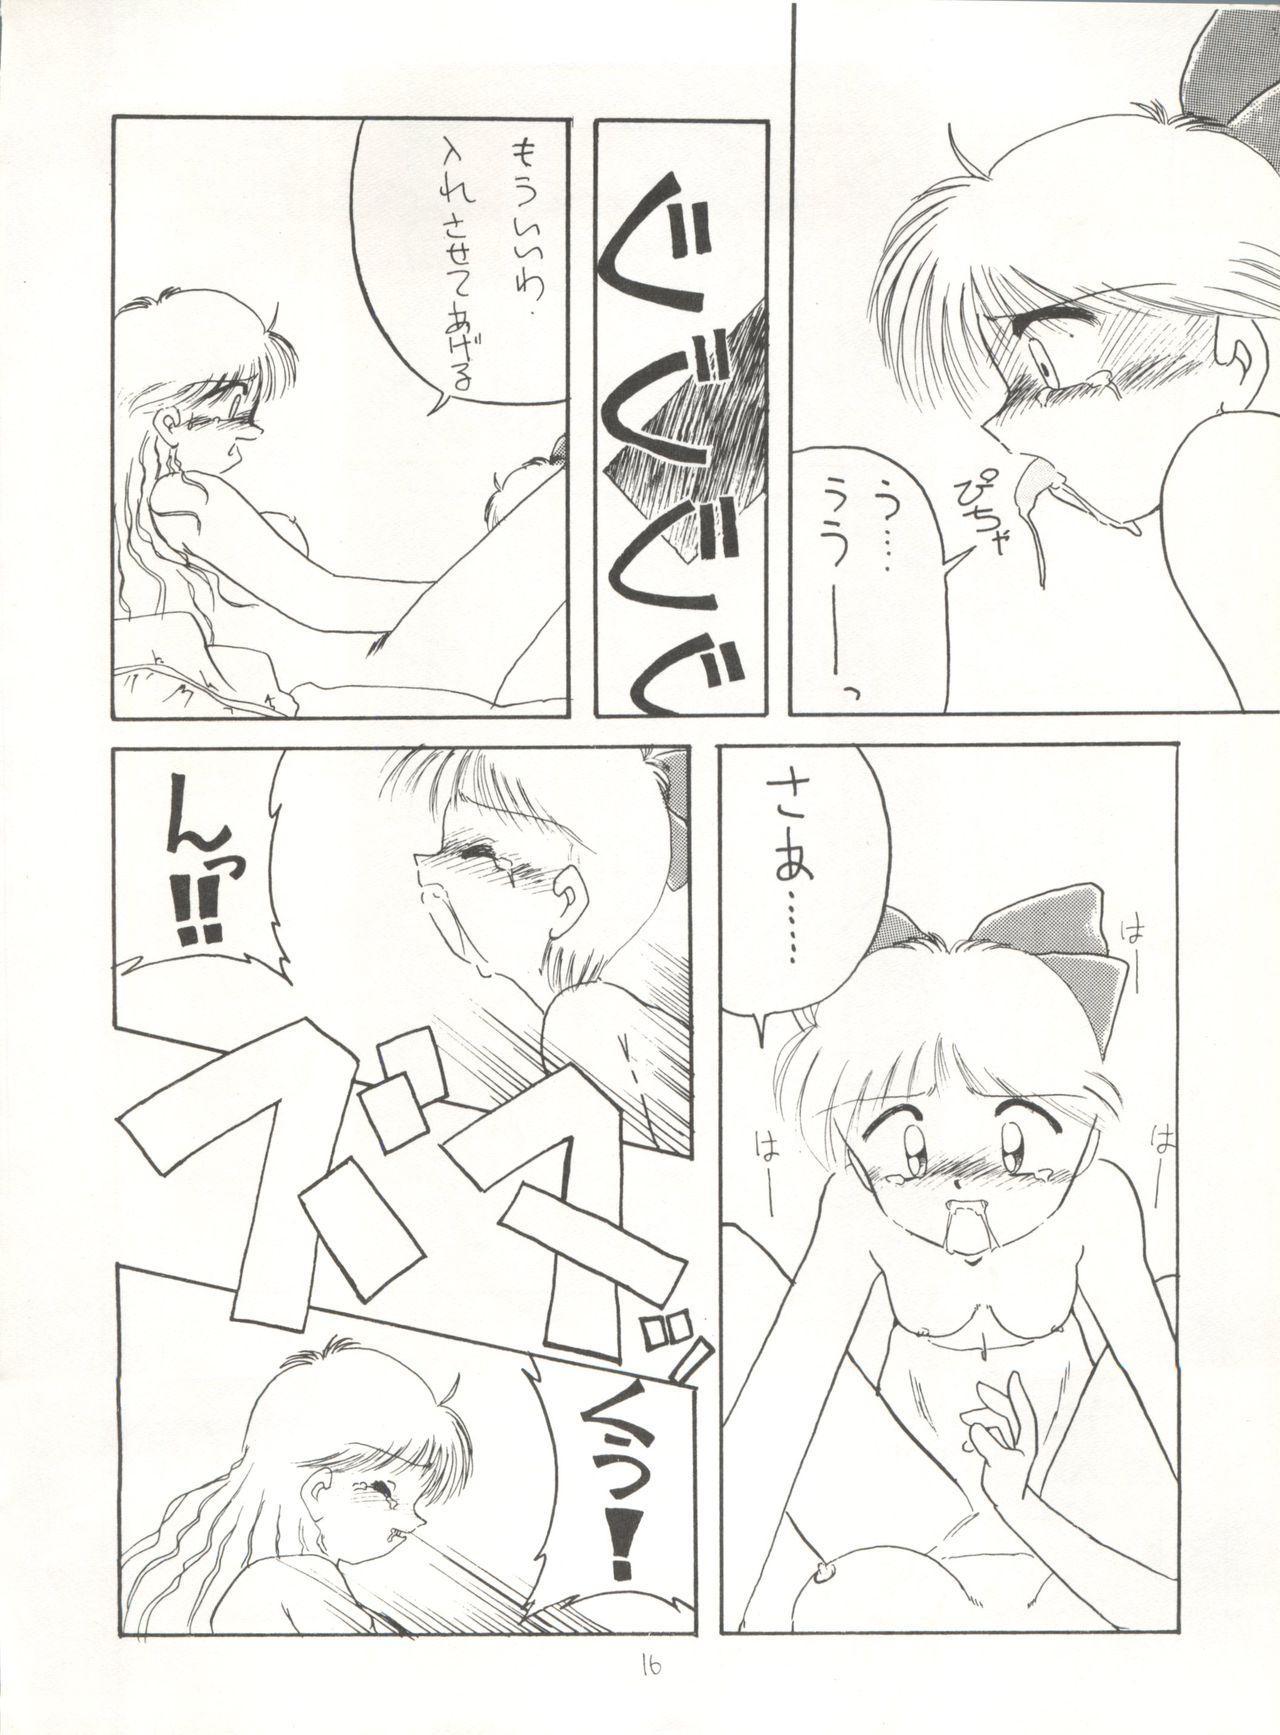 [Global One (MARO)] Sadistic 5 (Cutey Honey, Devilman, Sailor Moon), [Global One (MARO)] Sadistic (Dirty Pair, Fushigi no Umi no Nadia, Sailor Moon), [Studio Ikkatsumajin] .ribbon (Hime-chan's Ribbon) 139